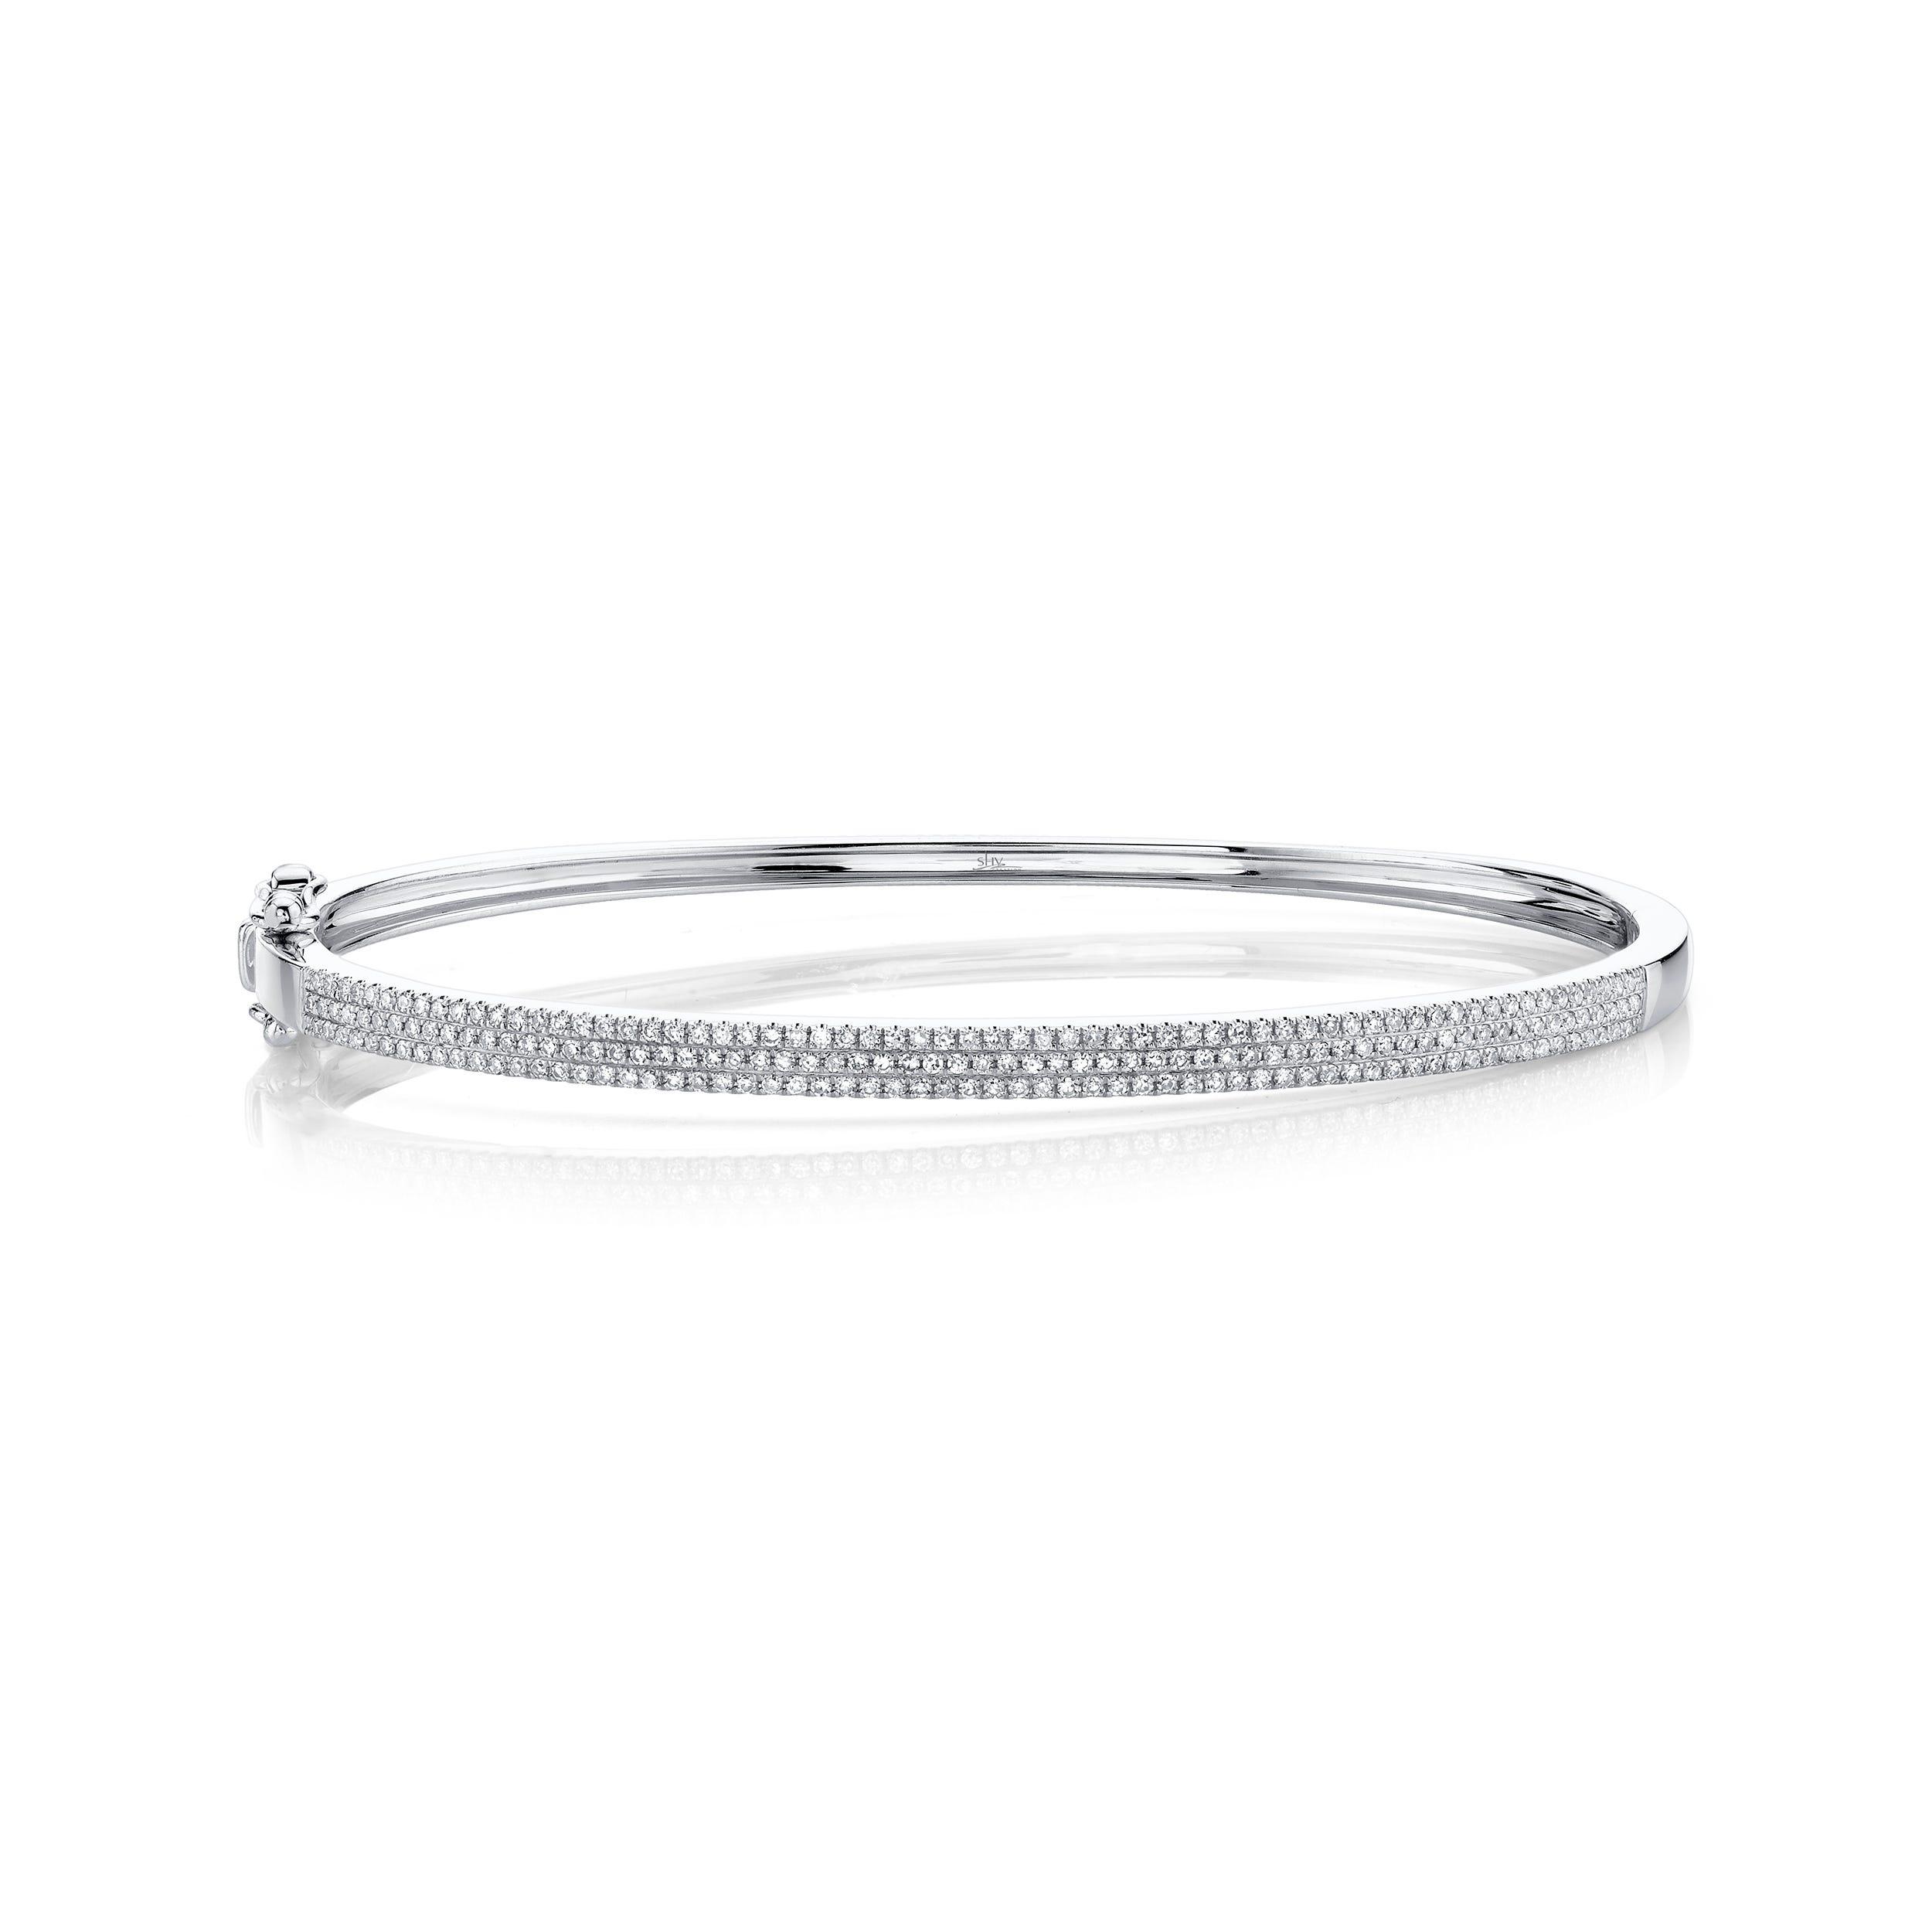 Shy Creation Diamond ½ct. Pave Bangle Bracelet 14k White Gold SC55002255ZS